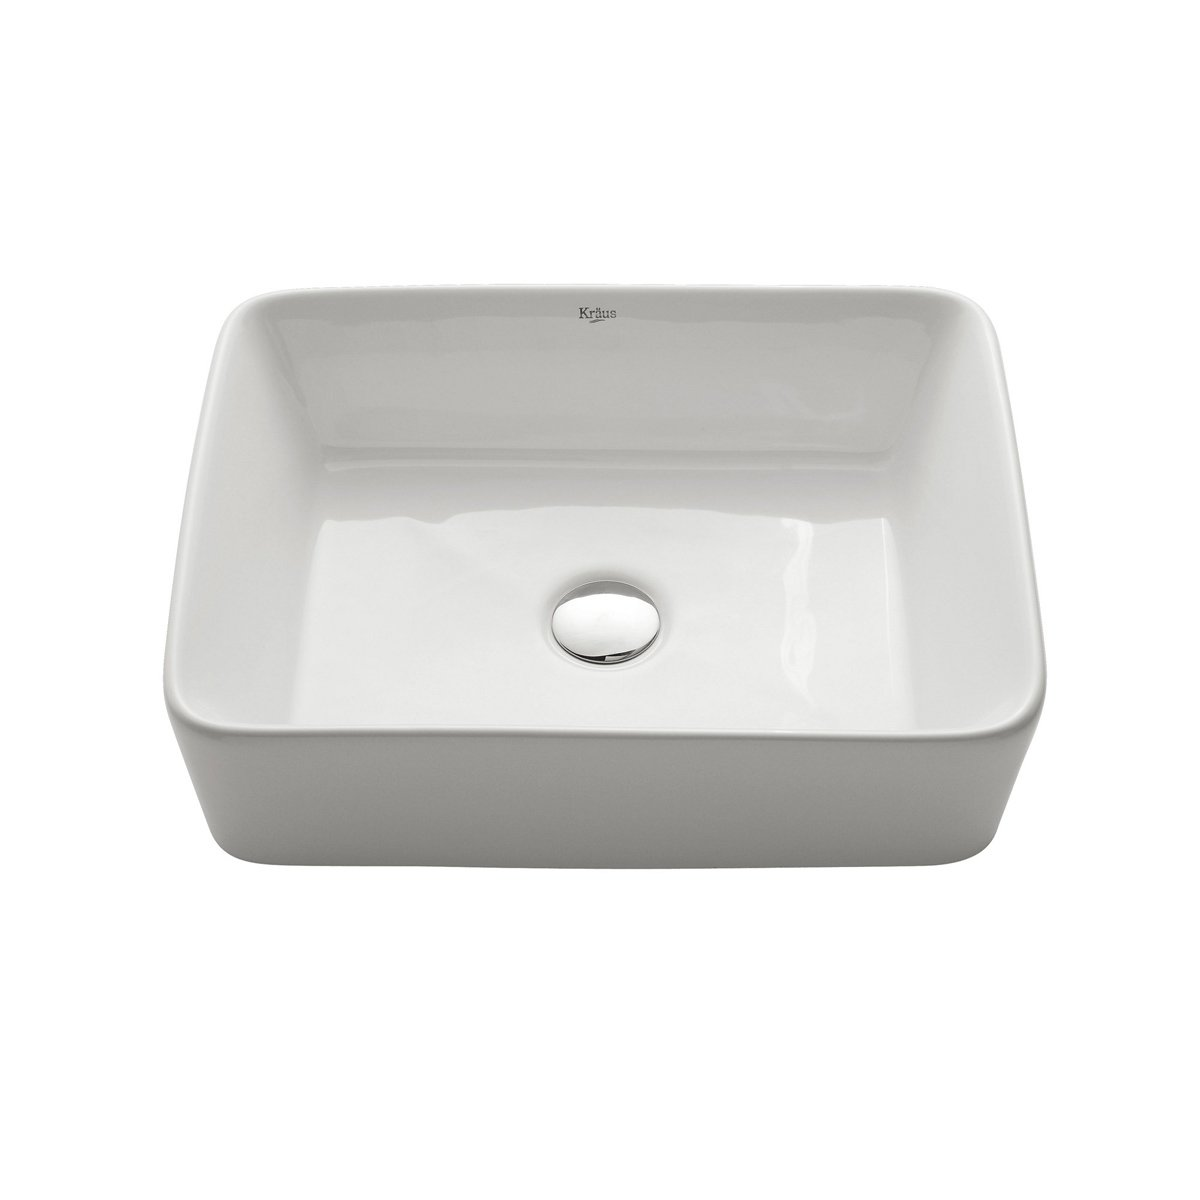 Delightful Best Ceramic Sinks 2017